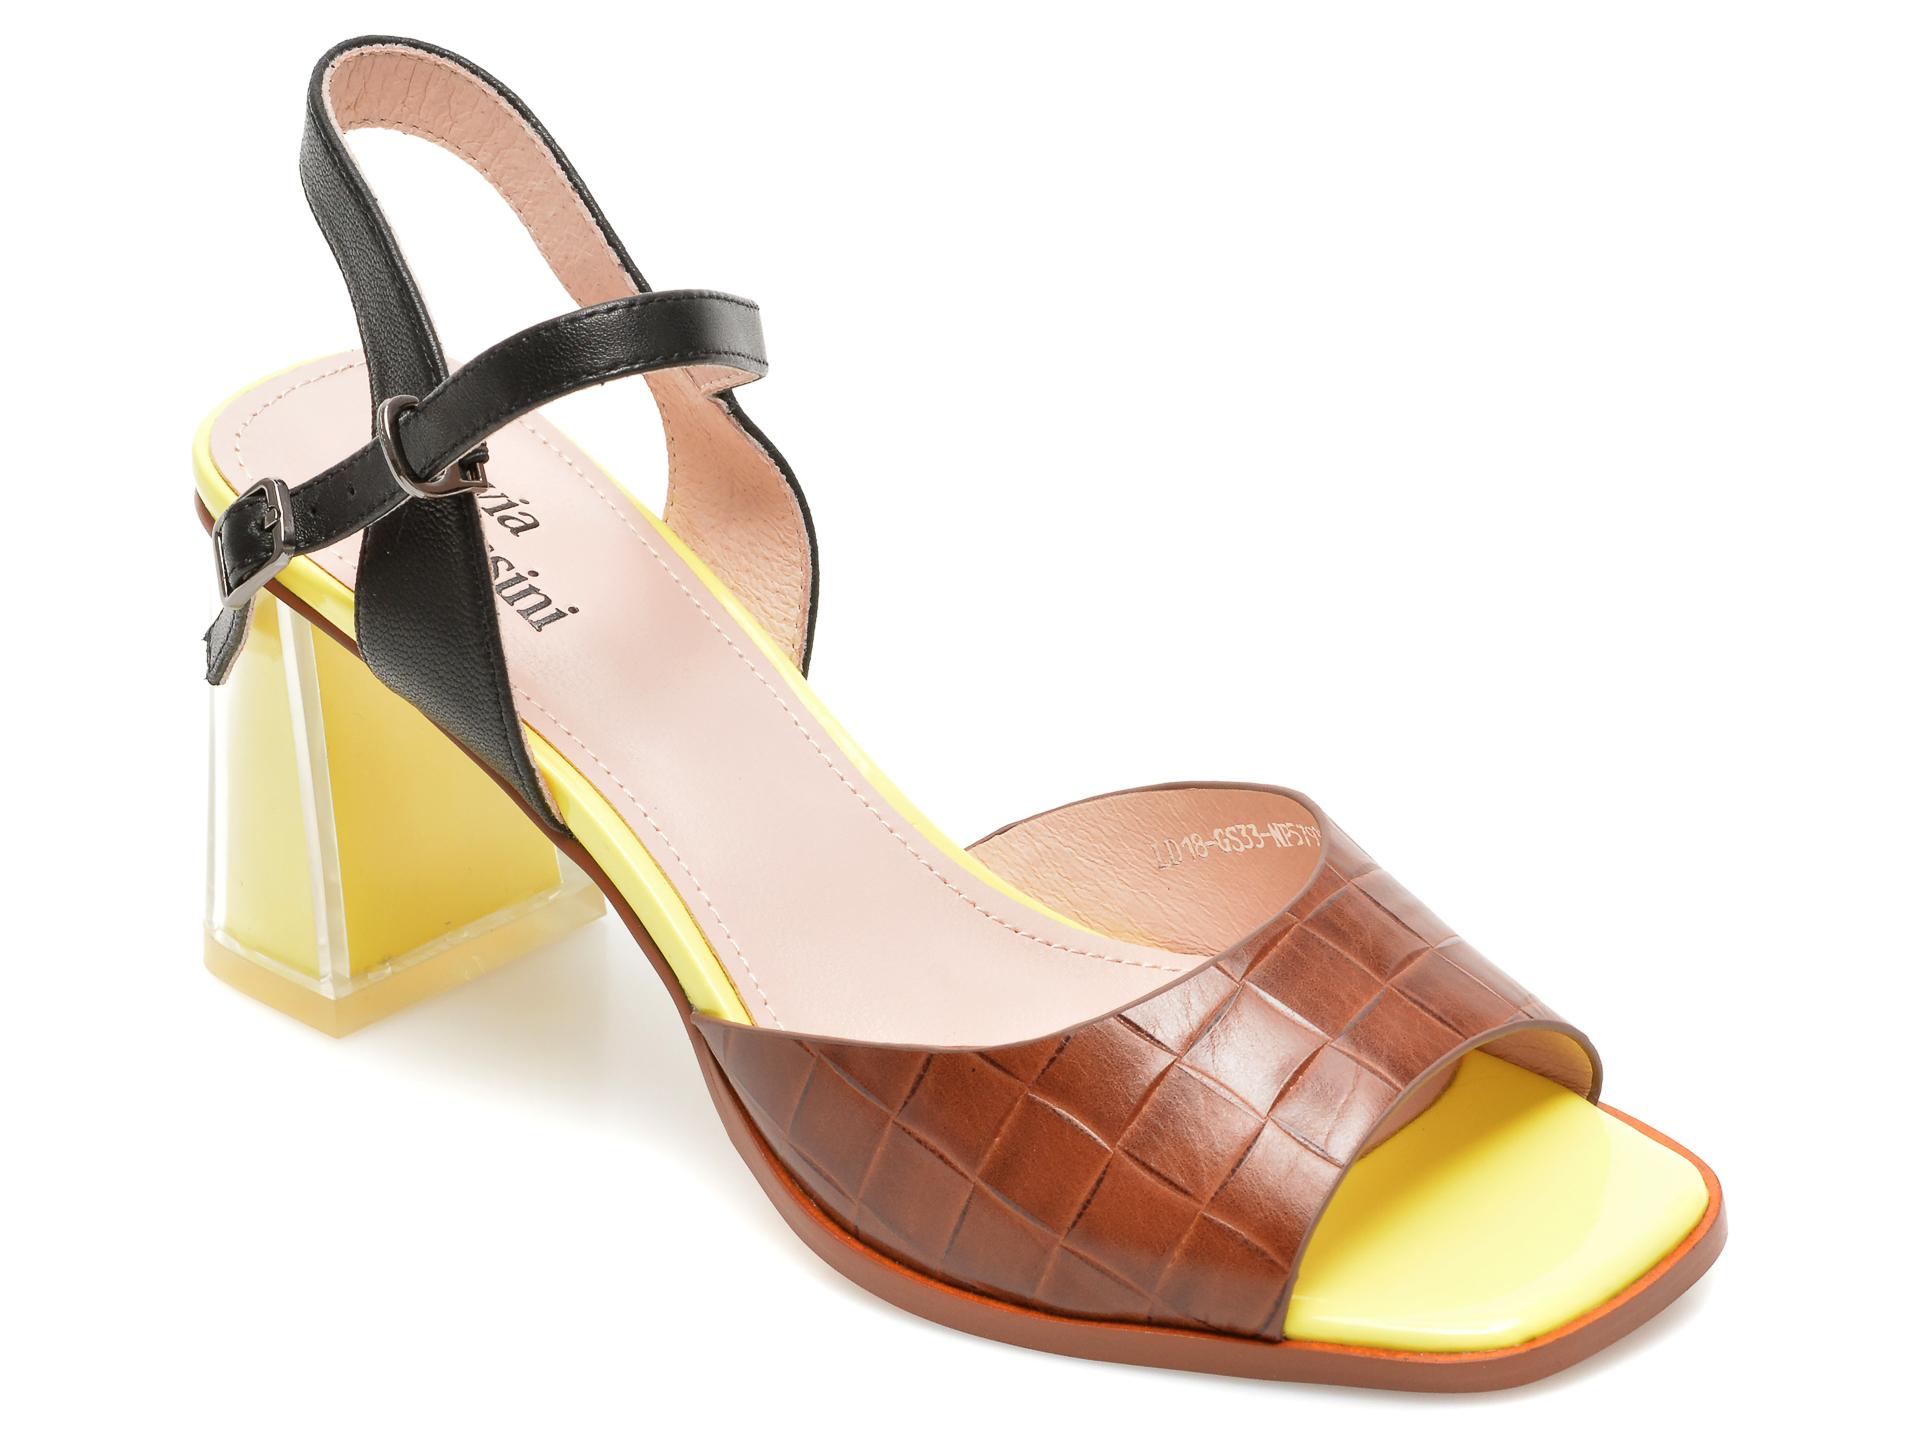 Sandale FLAVIA PASSINI maro, LD18GS3, din piele naturala